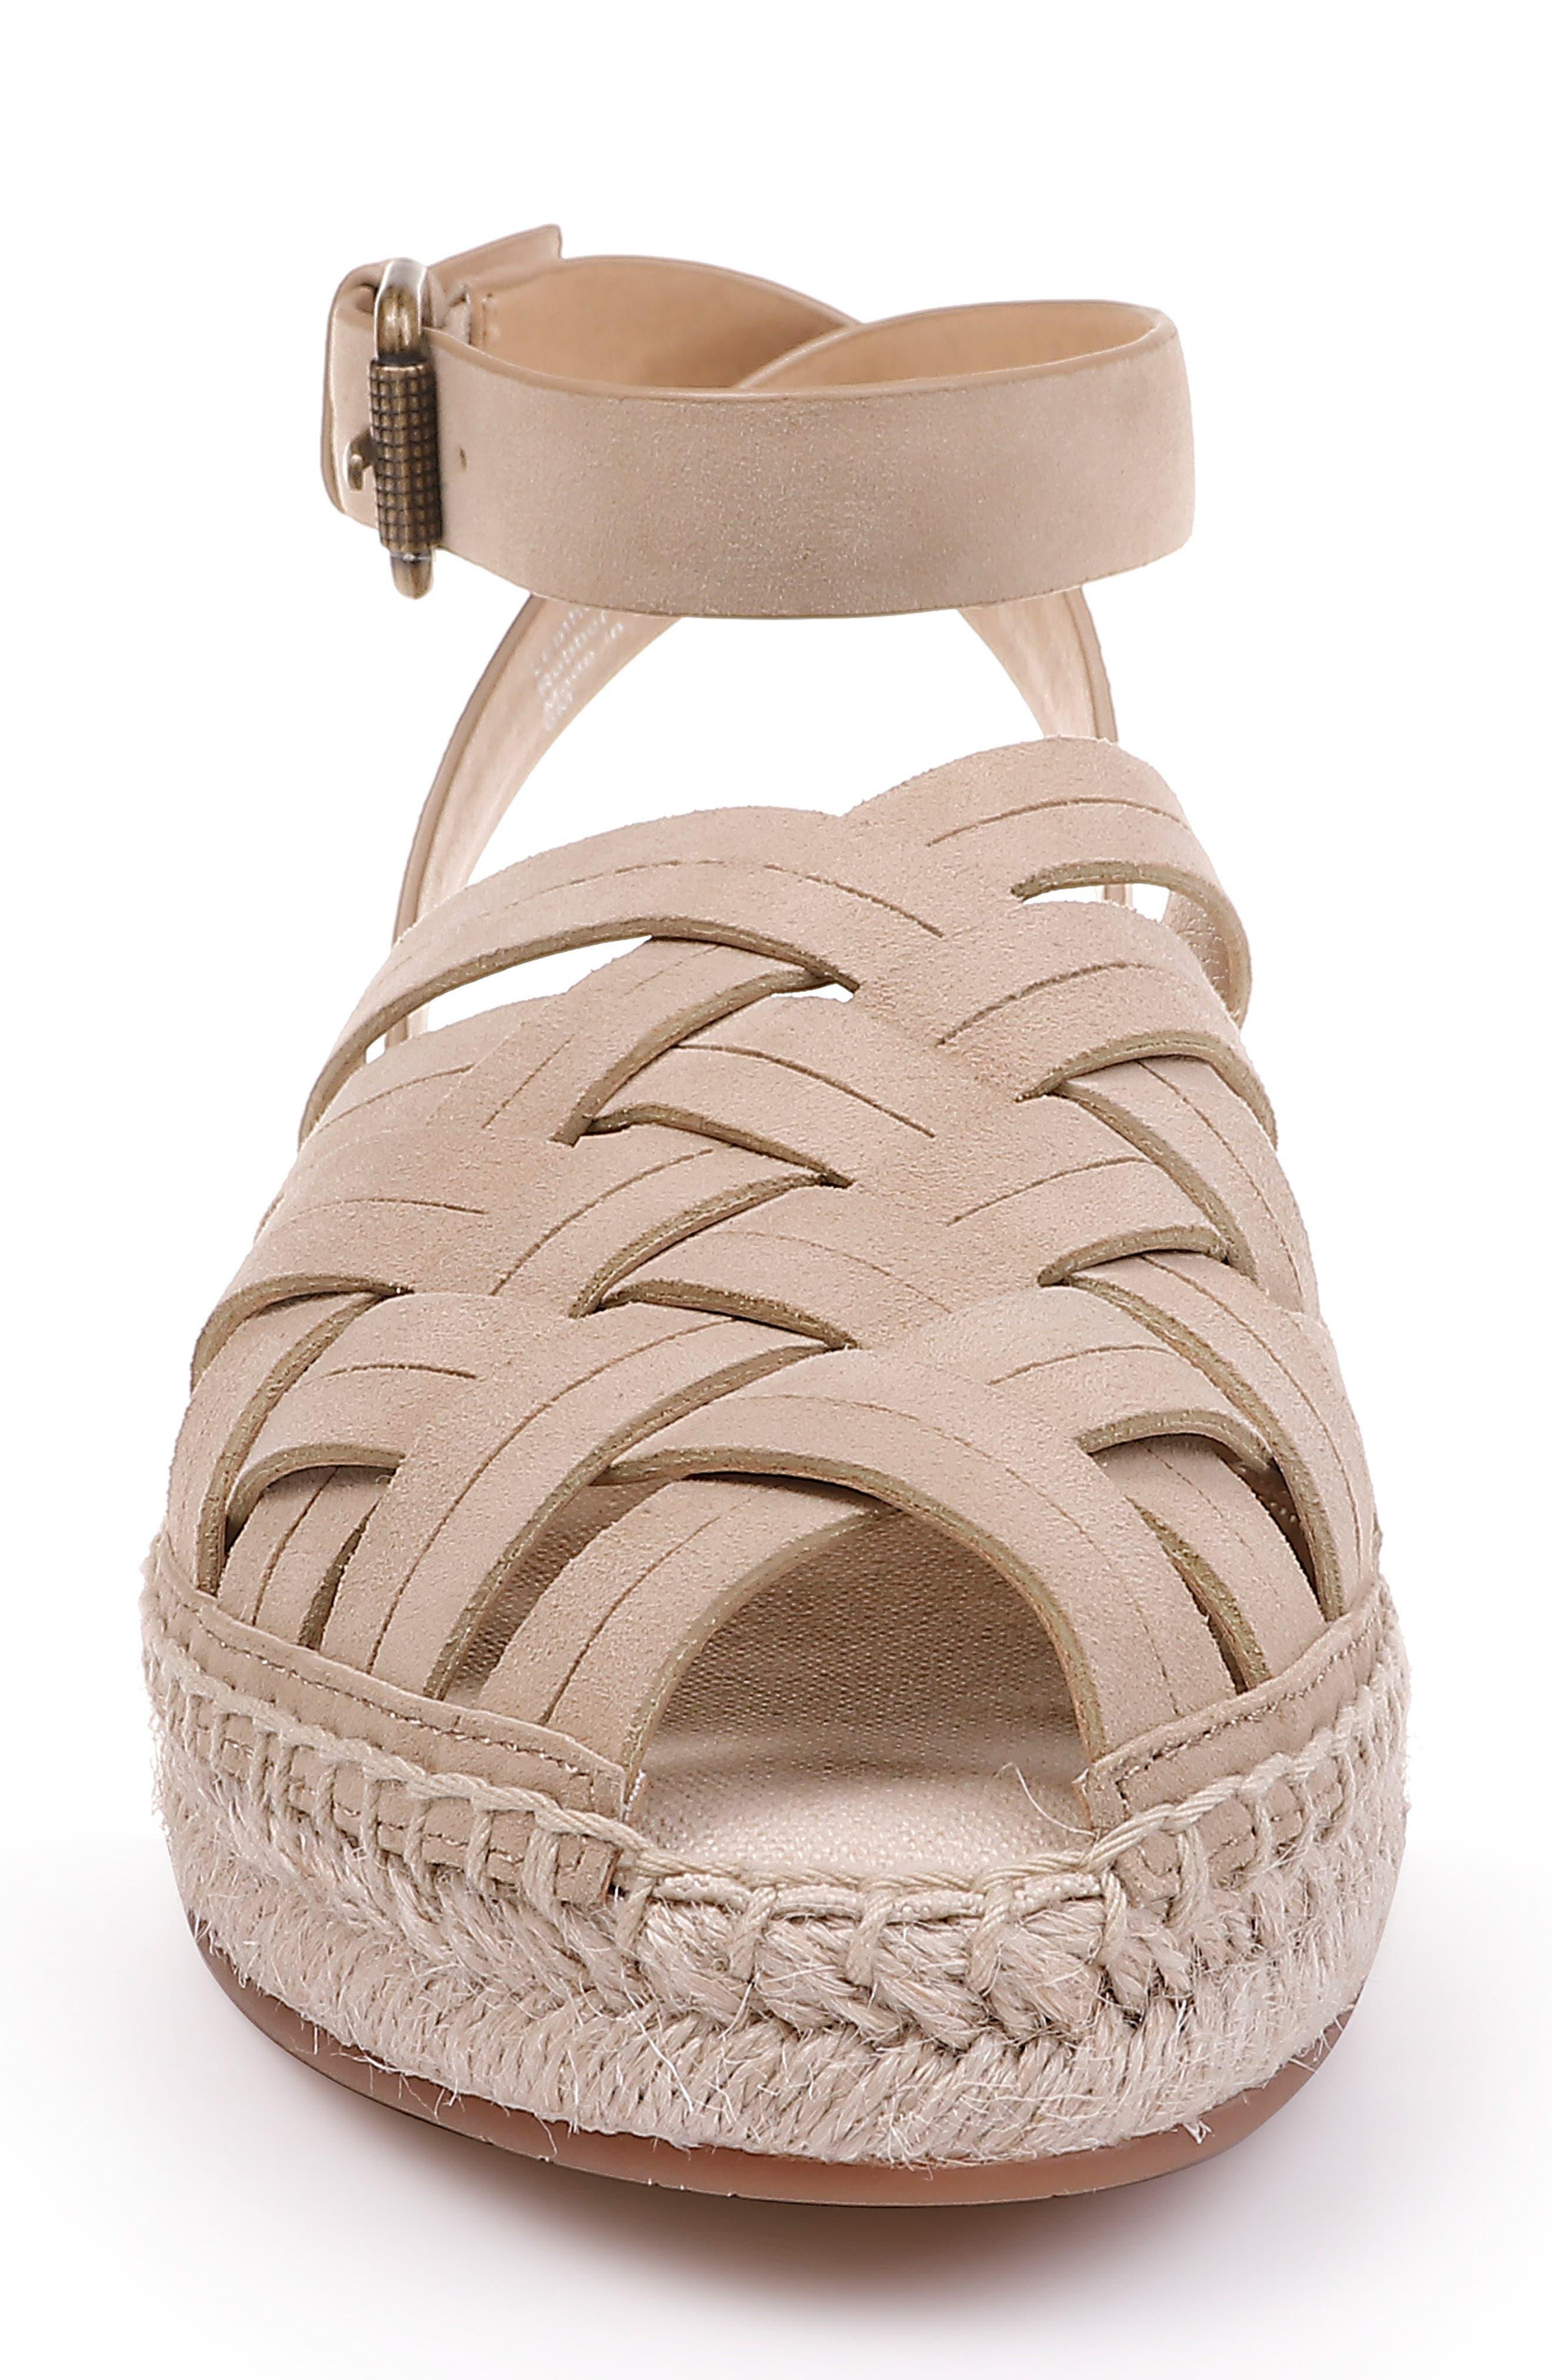 SPLENDID, Sheryl Espadrille Ankle Strap Sandal, Alternate thumbnail 4, color, MUSHROOM SUEDE